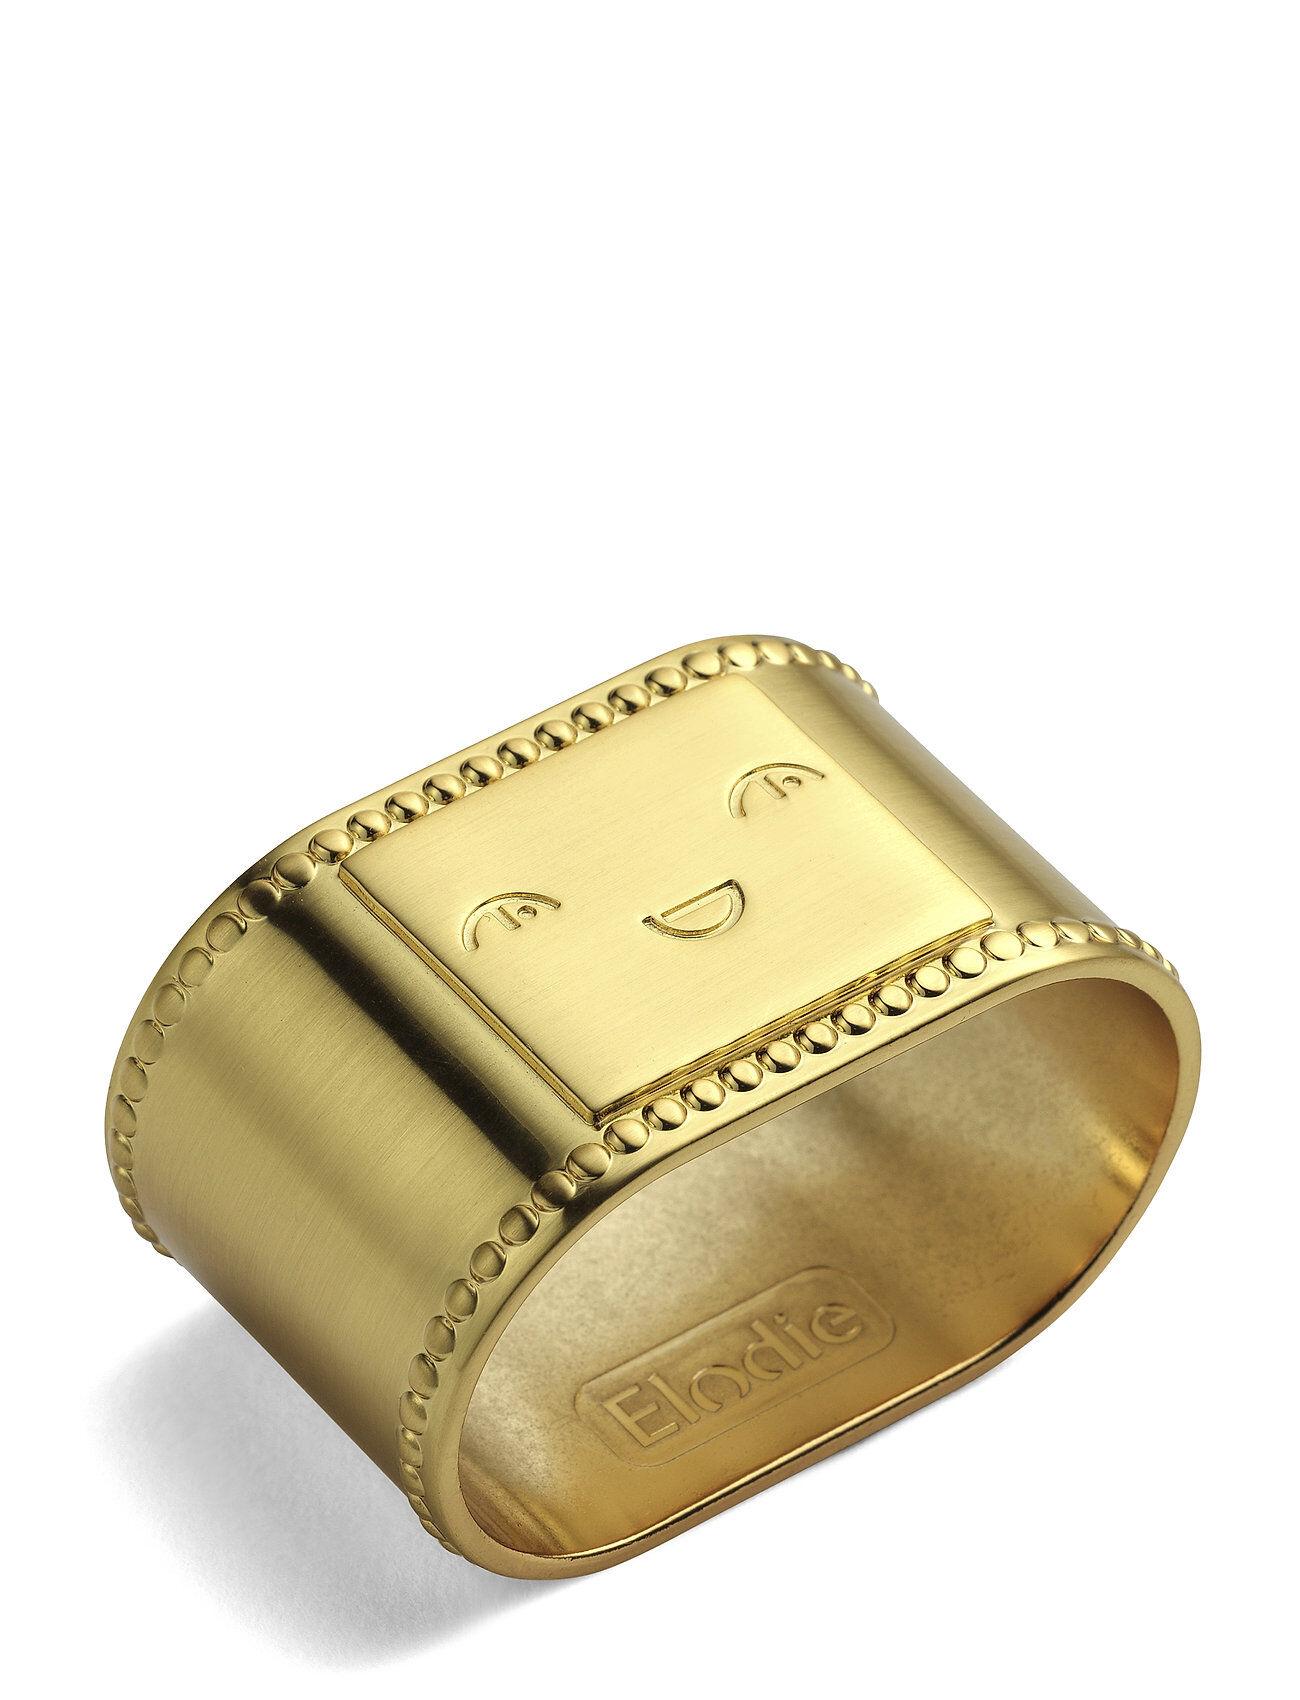 Elodie Details Napkin Ring - Matt Gold/Brass Home Meal Time Napkins & Accessories Kulta Elodie Details